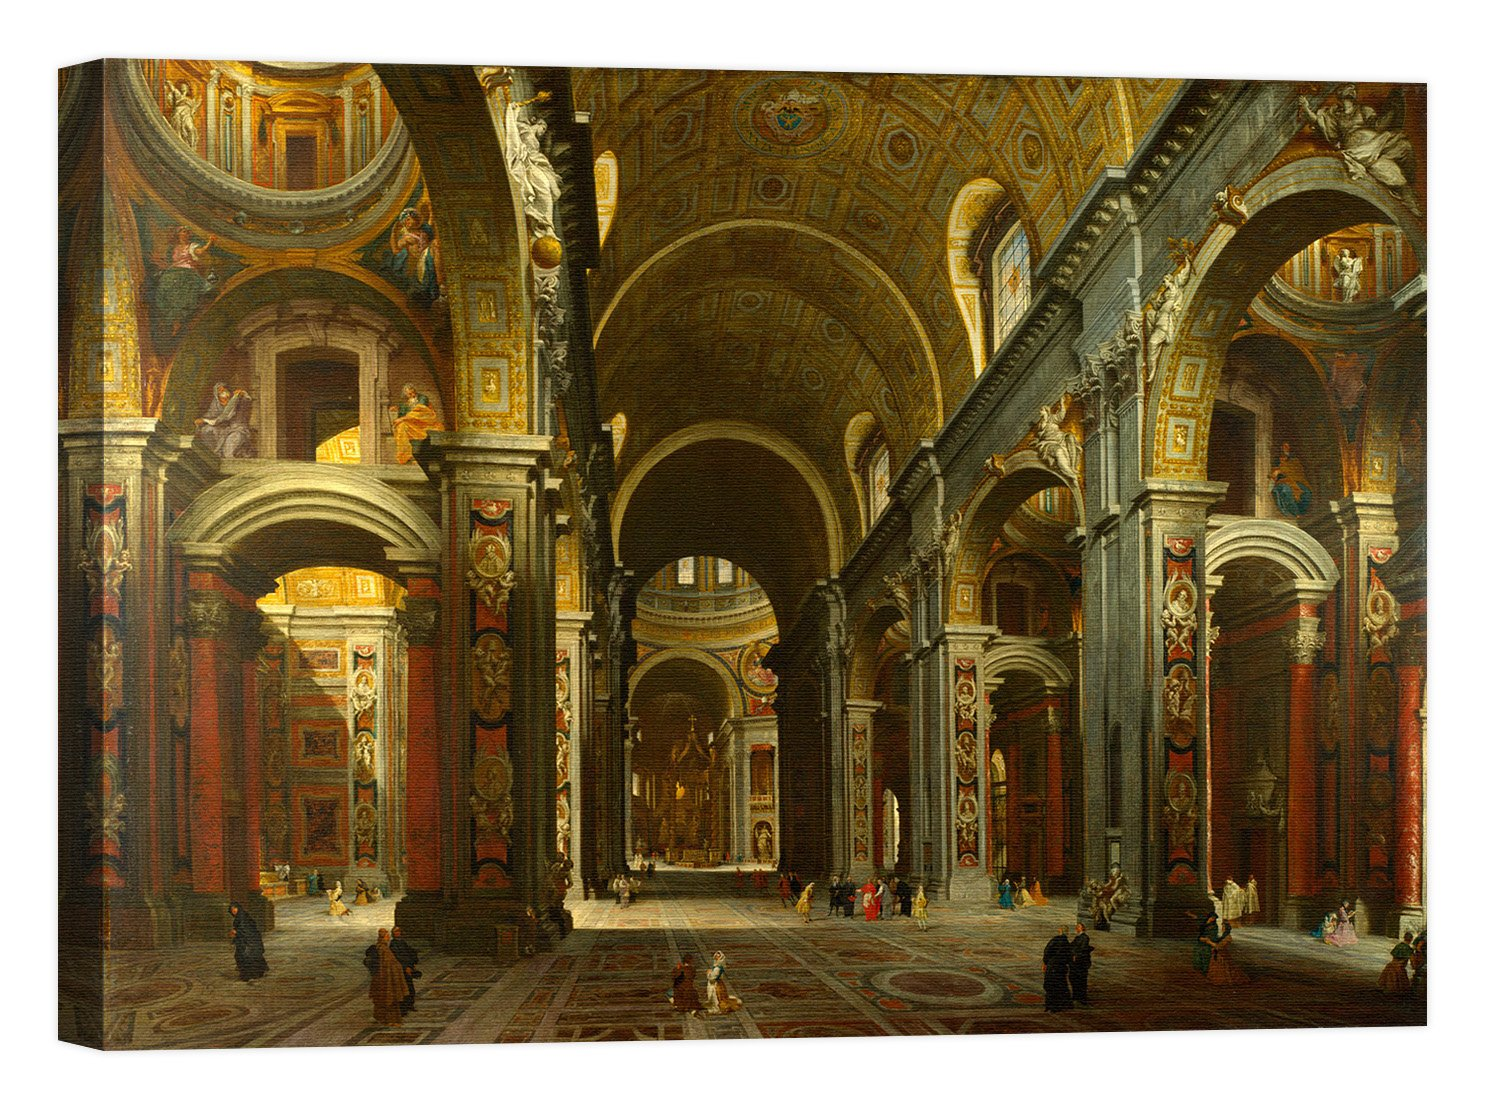 Rahmen Druck auf Leinwand mit Rahmen in Holz Giovanni Paolo Panini The Interior Of St peter' S, Rome 80x60 CM